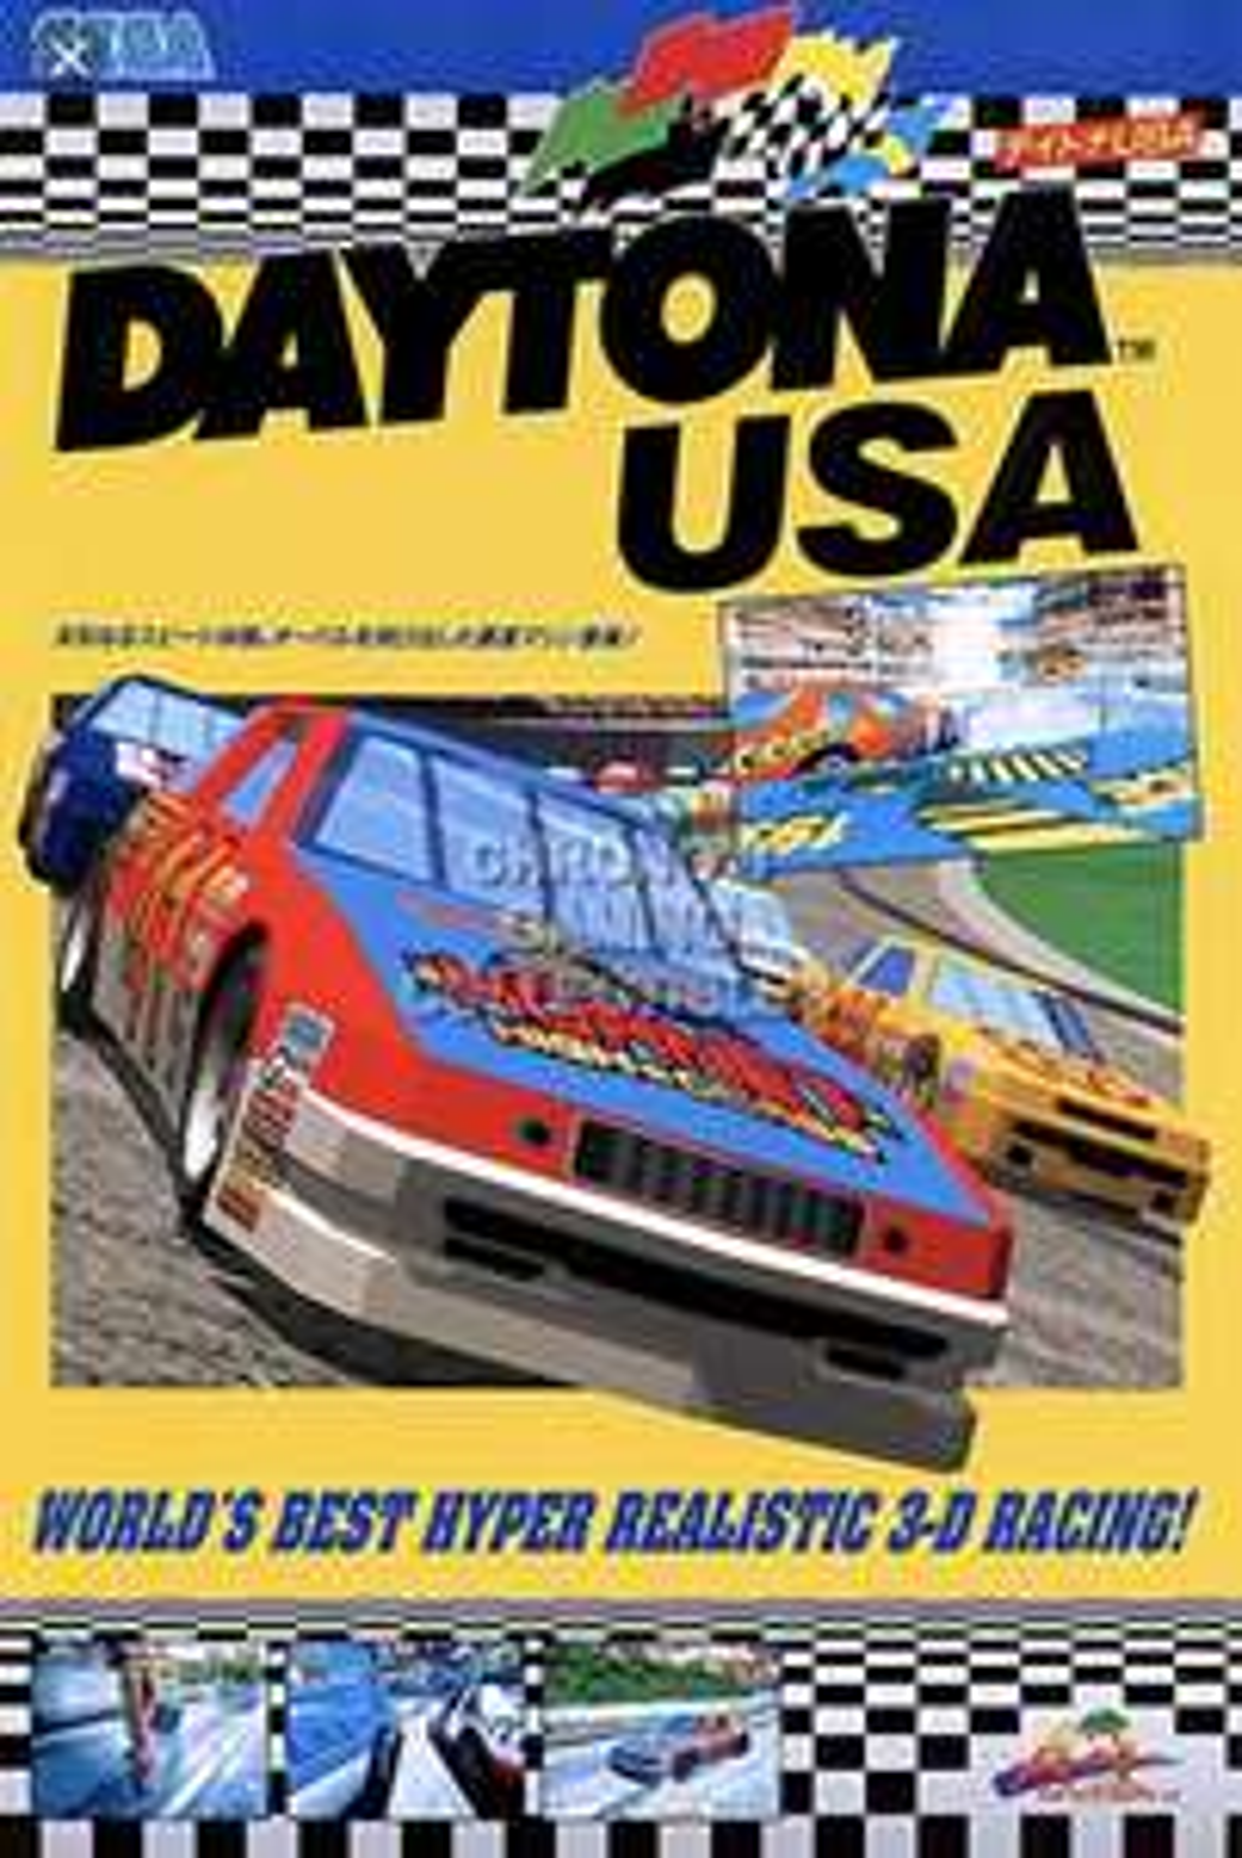 Daytona USA (Xbox one/Xbox 360) for £1.68 @ Microsoft Store